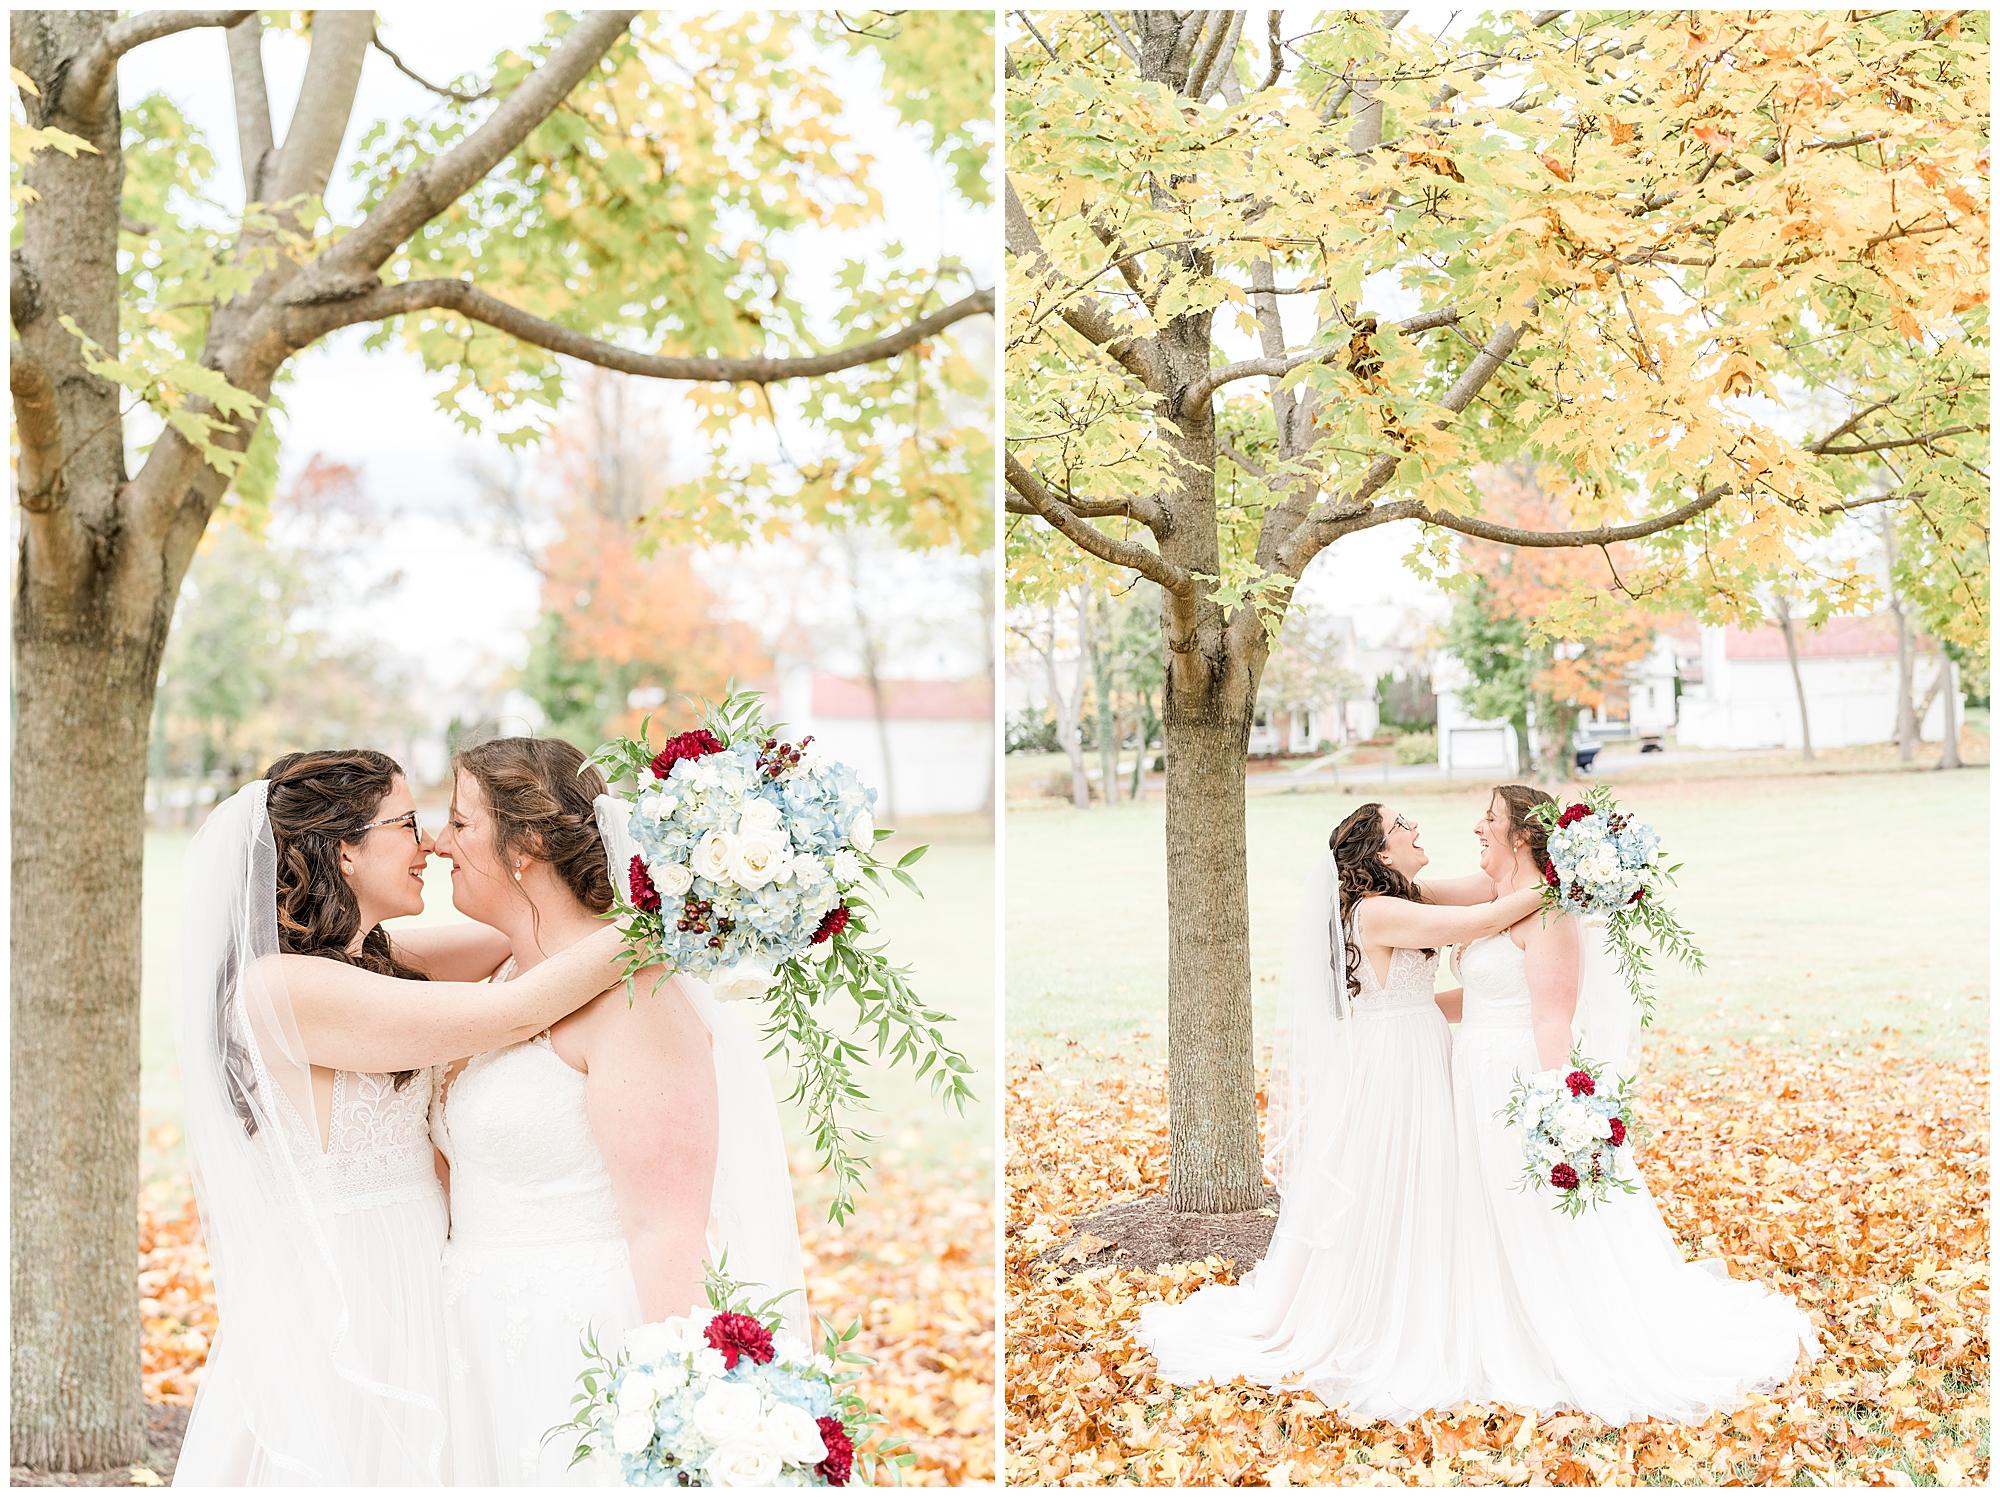 Antrim 1844 wedding photographer